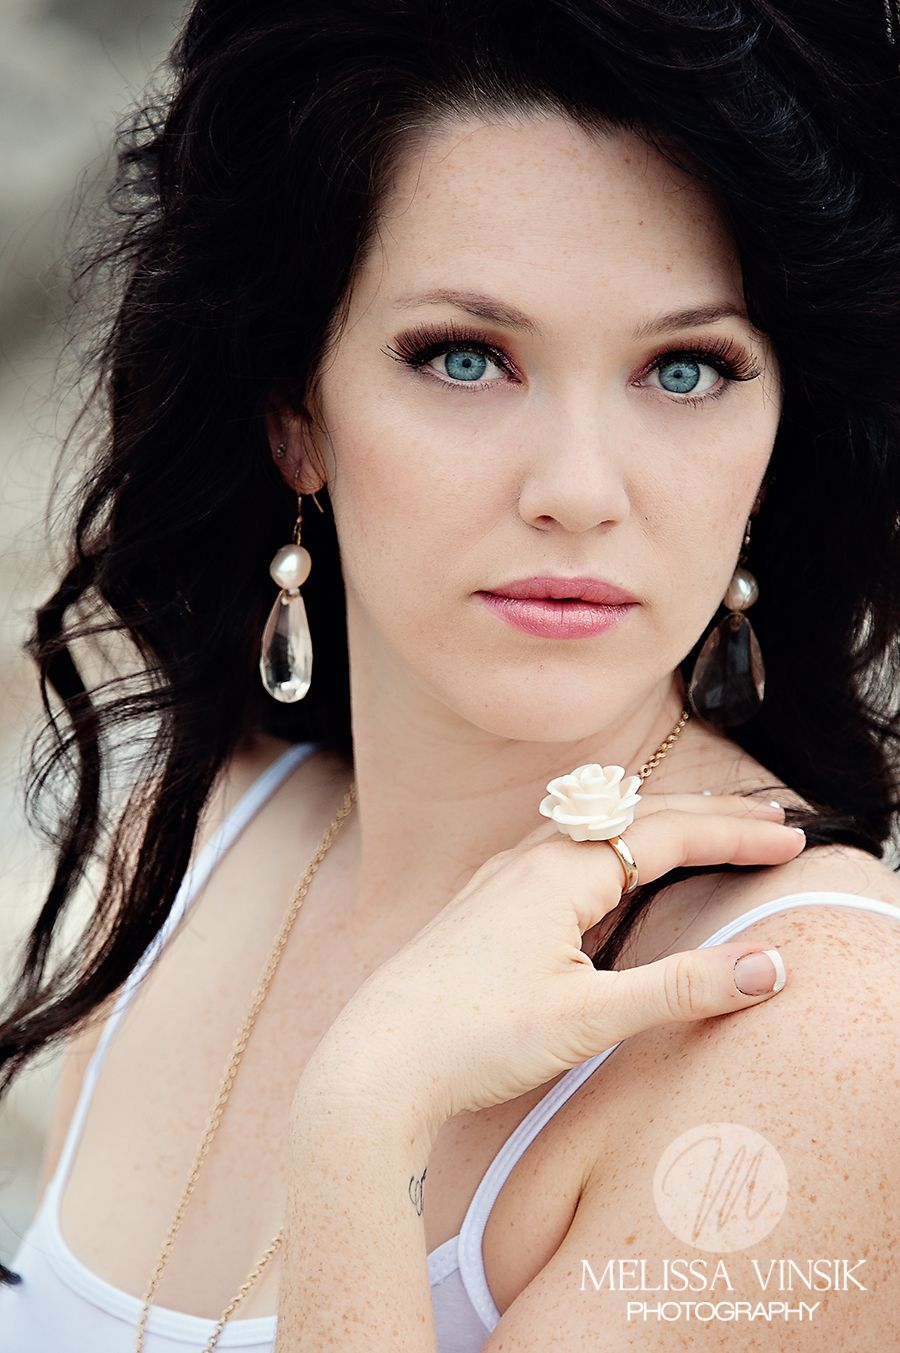 she is stunning. my favourite look, fair skin dark hair blue